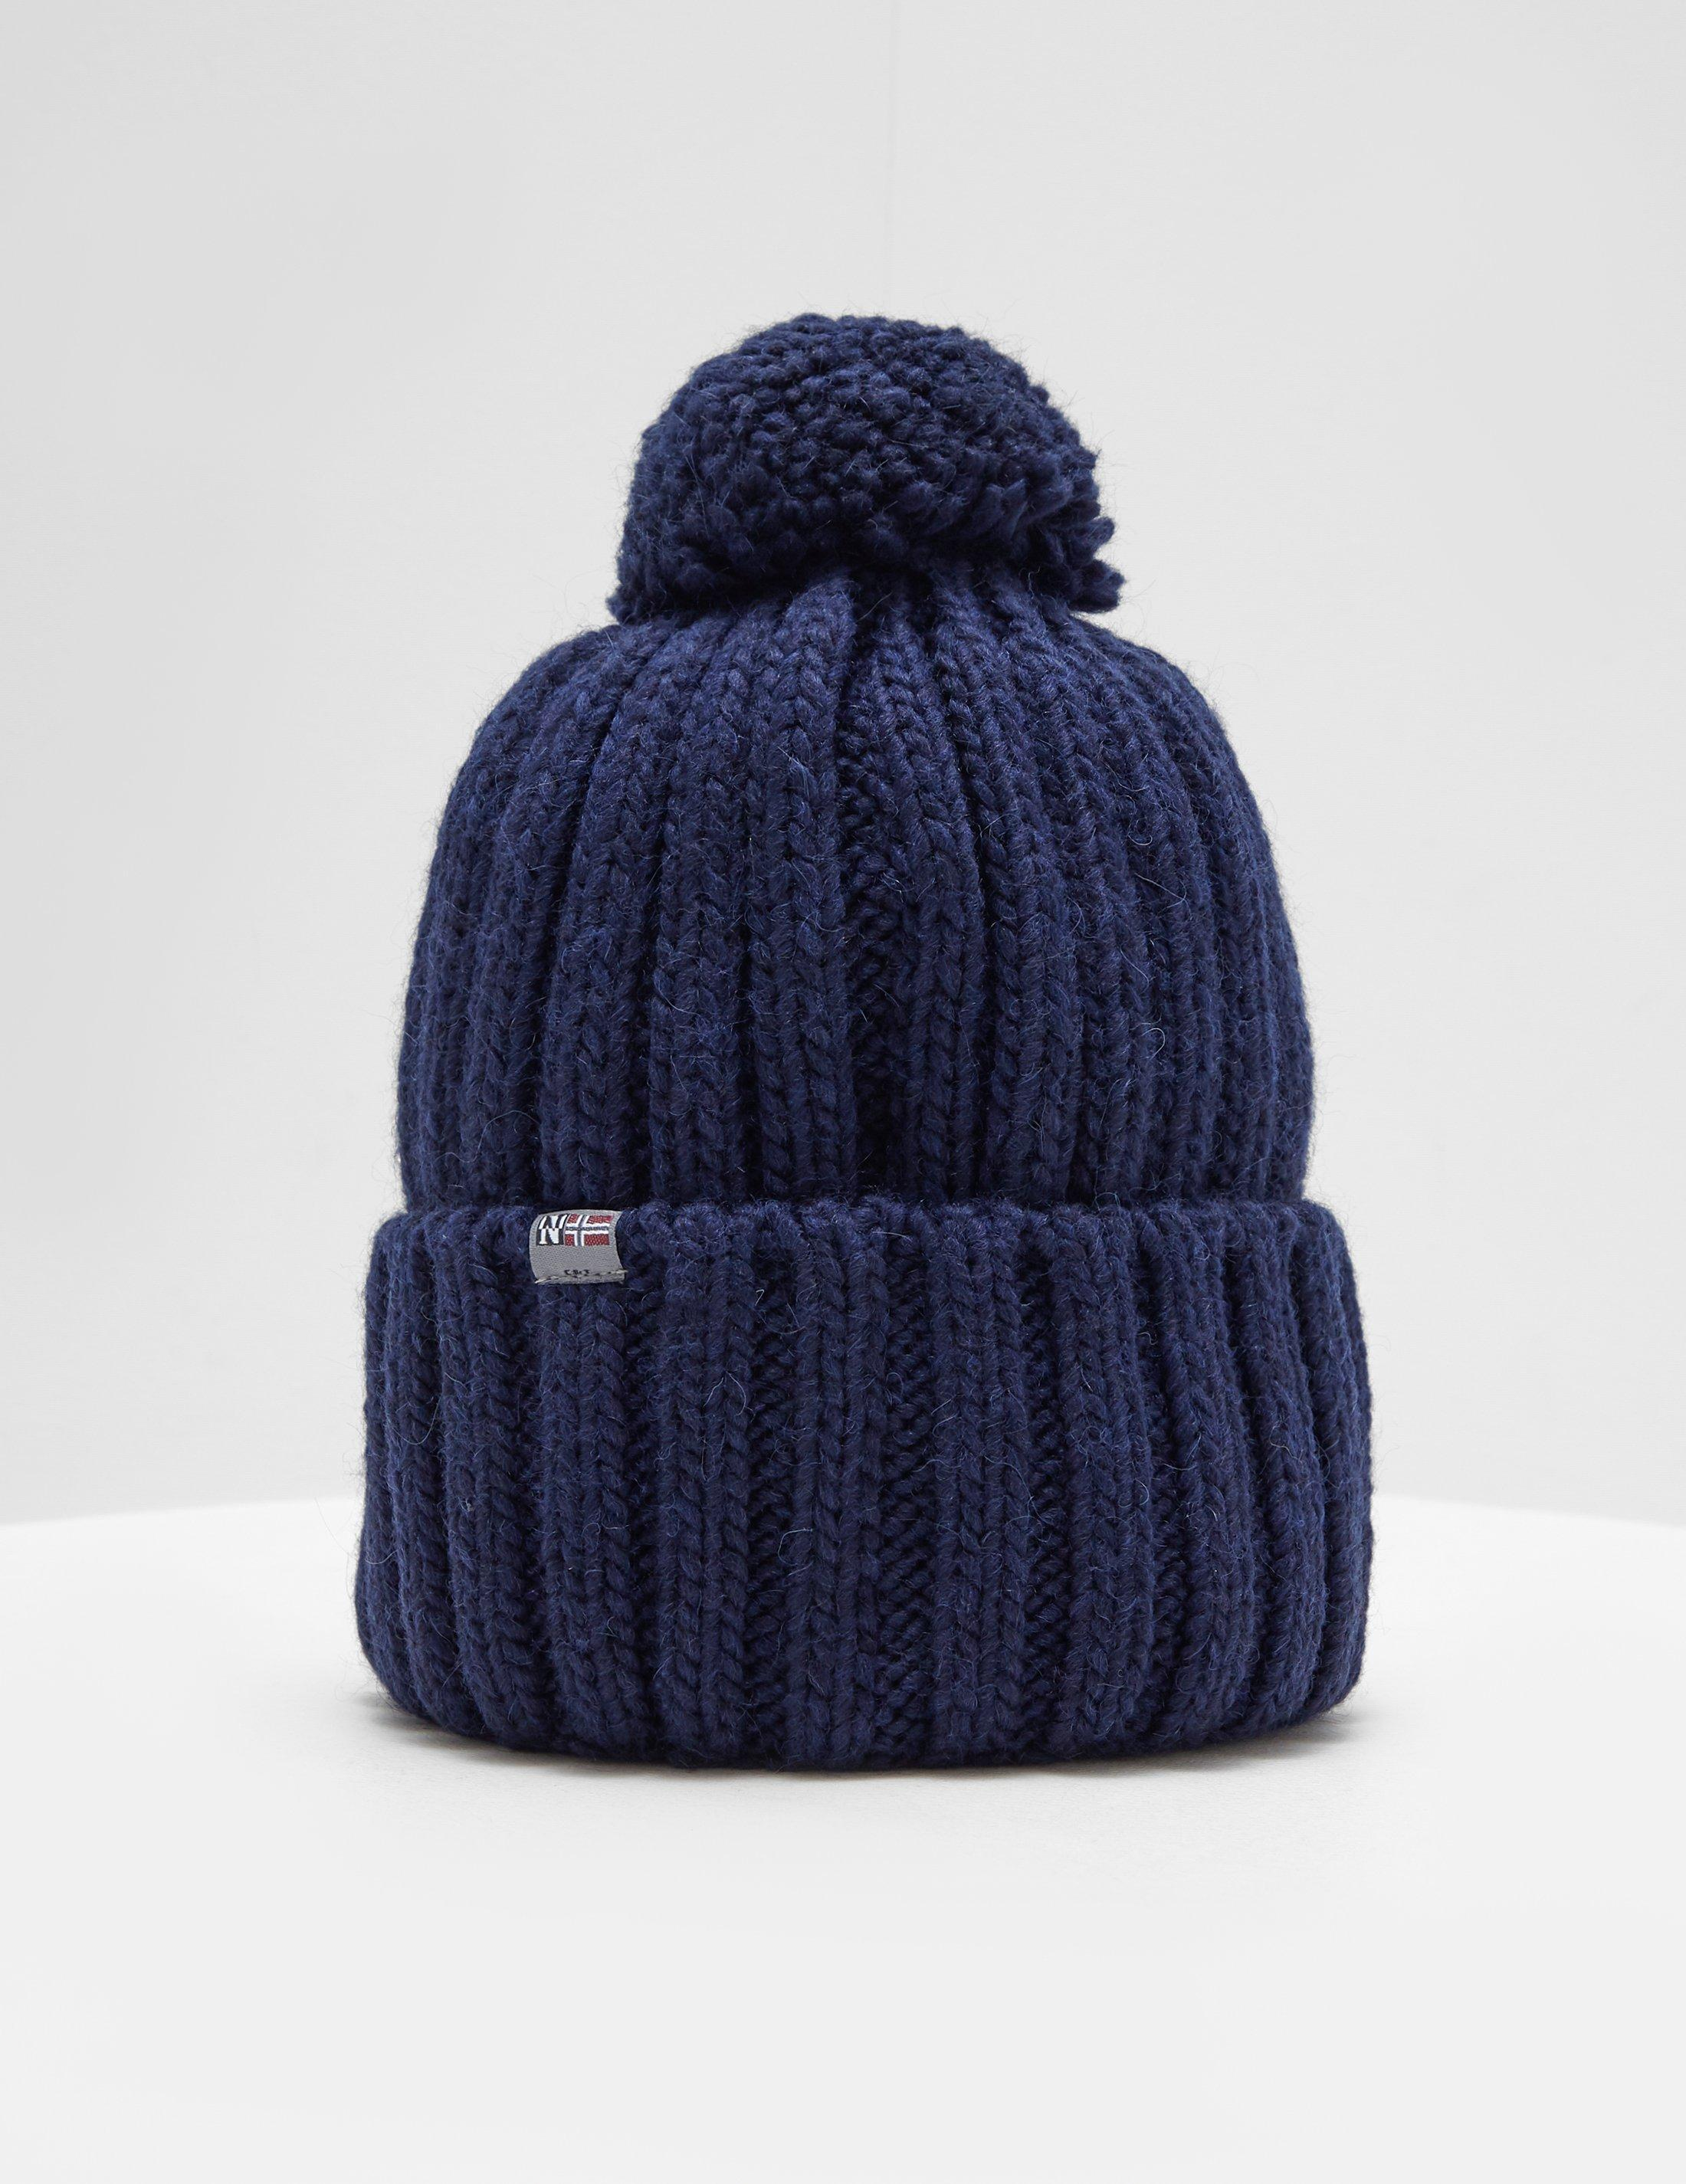 Napapijri Semiury Bobble Hat Navy Blue in Blue for Men - Lyst b370d59920cf